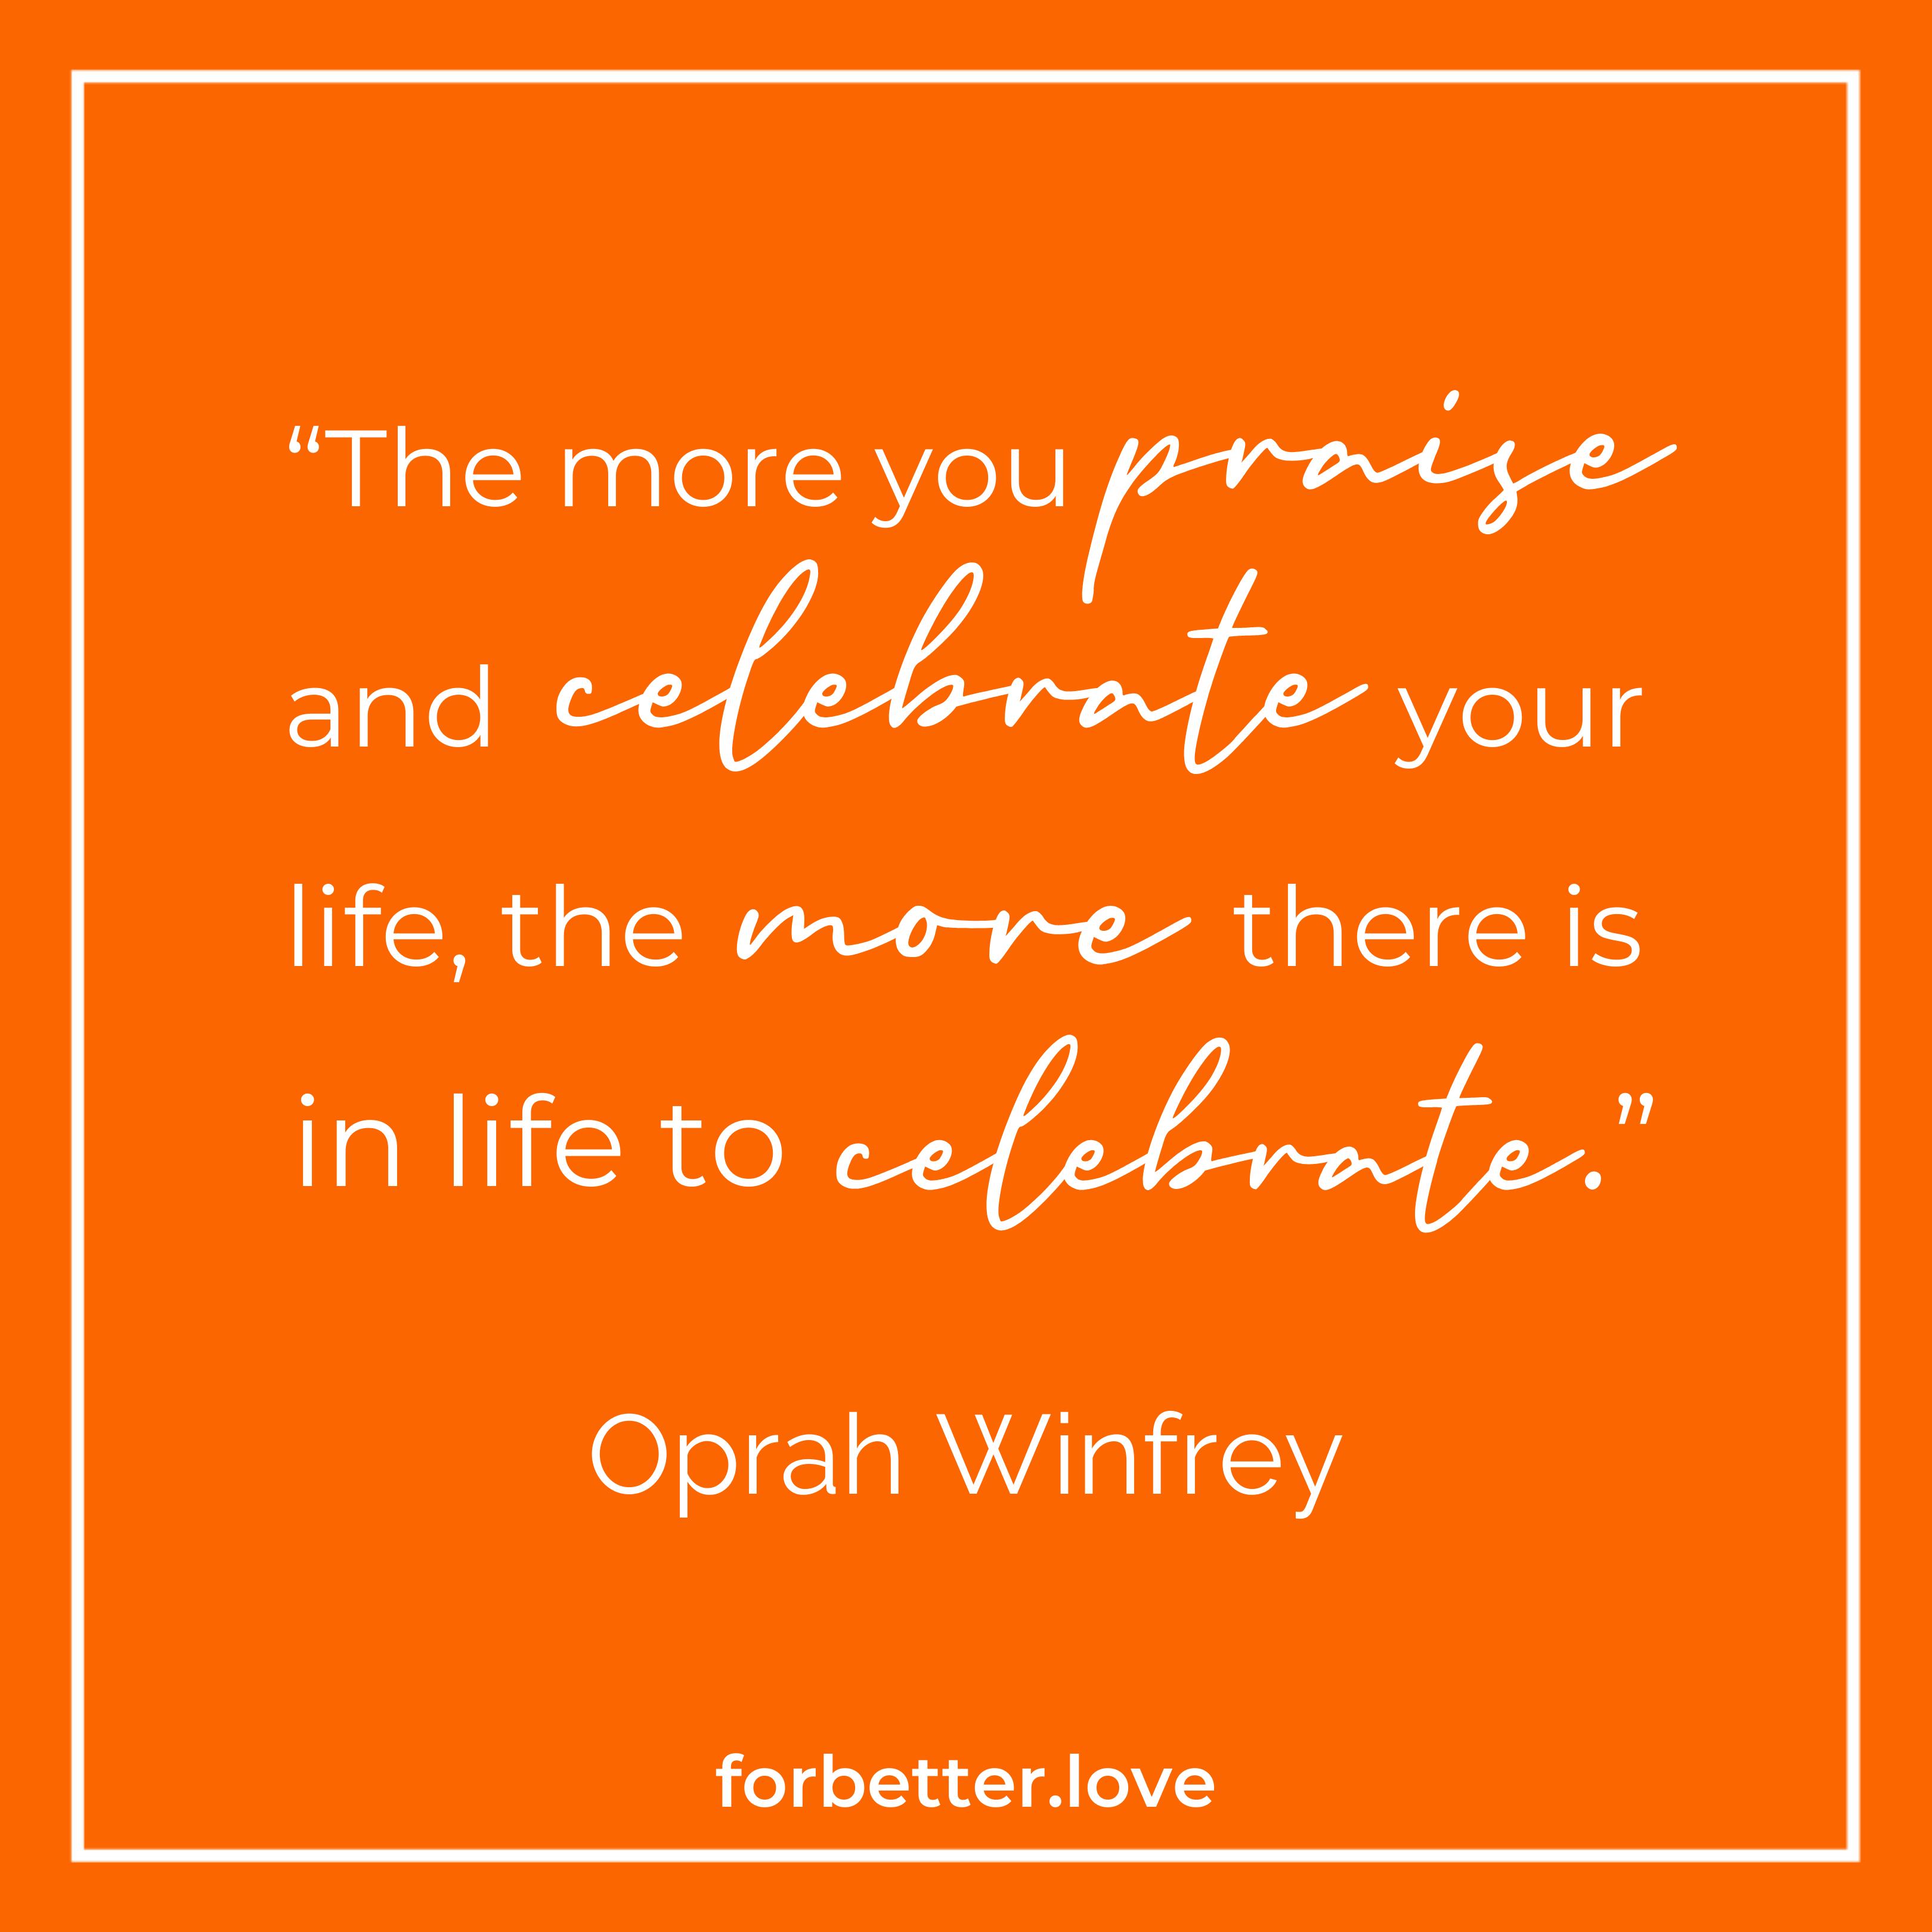 Oprah Winfrey quote on celebrate